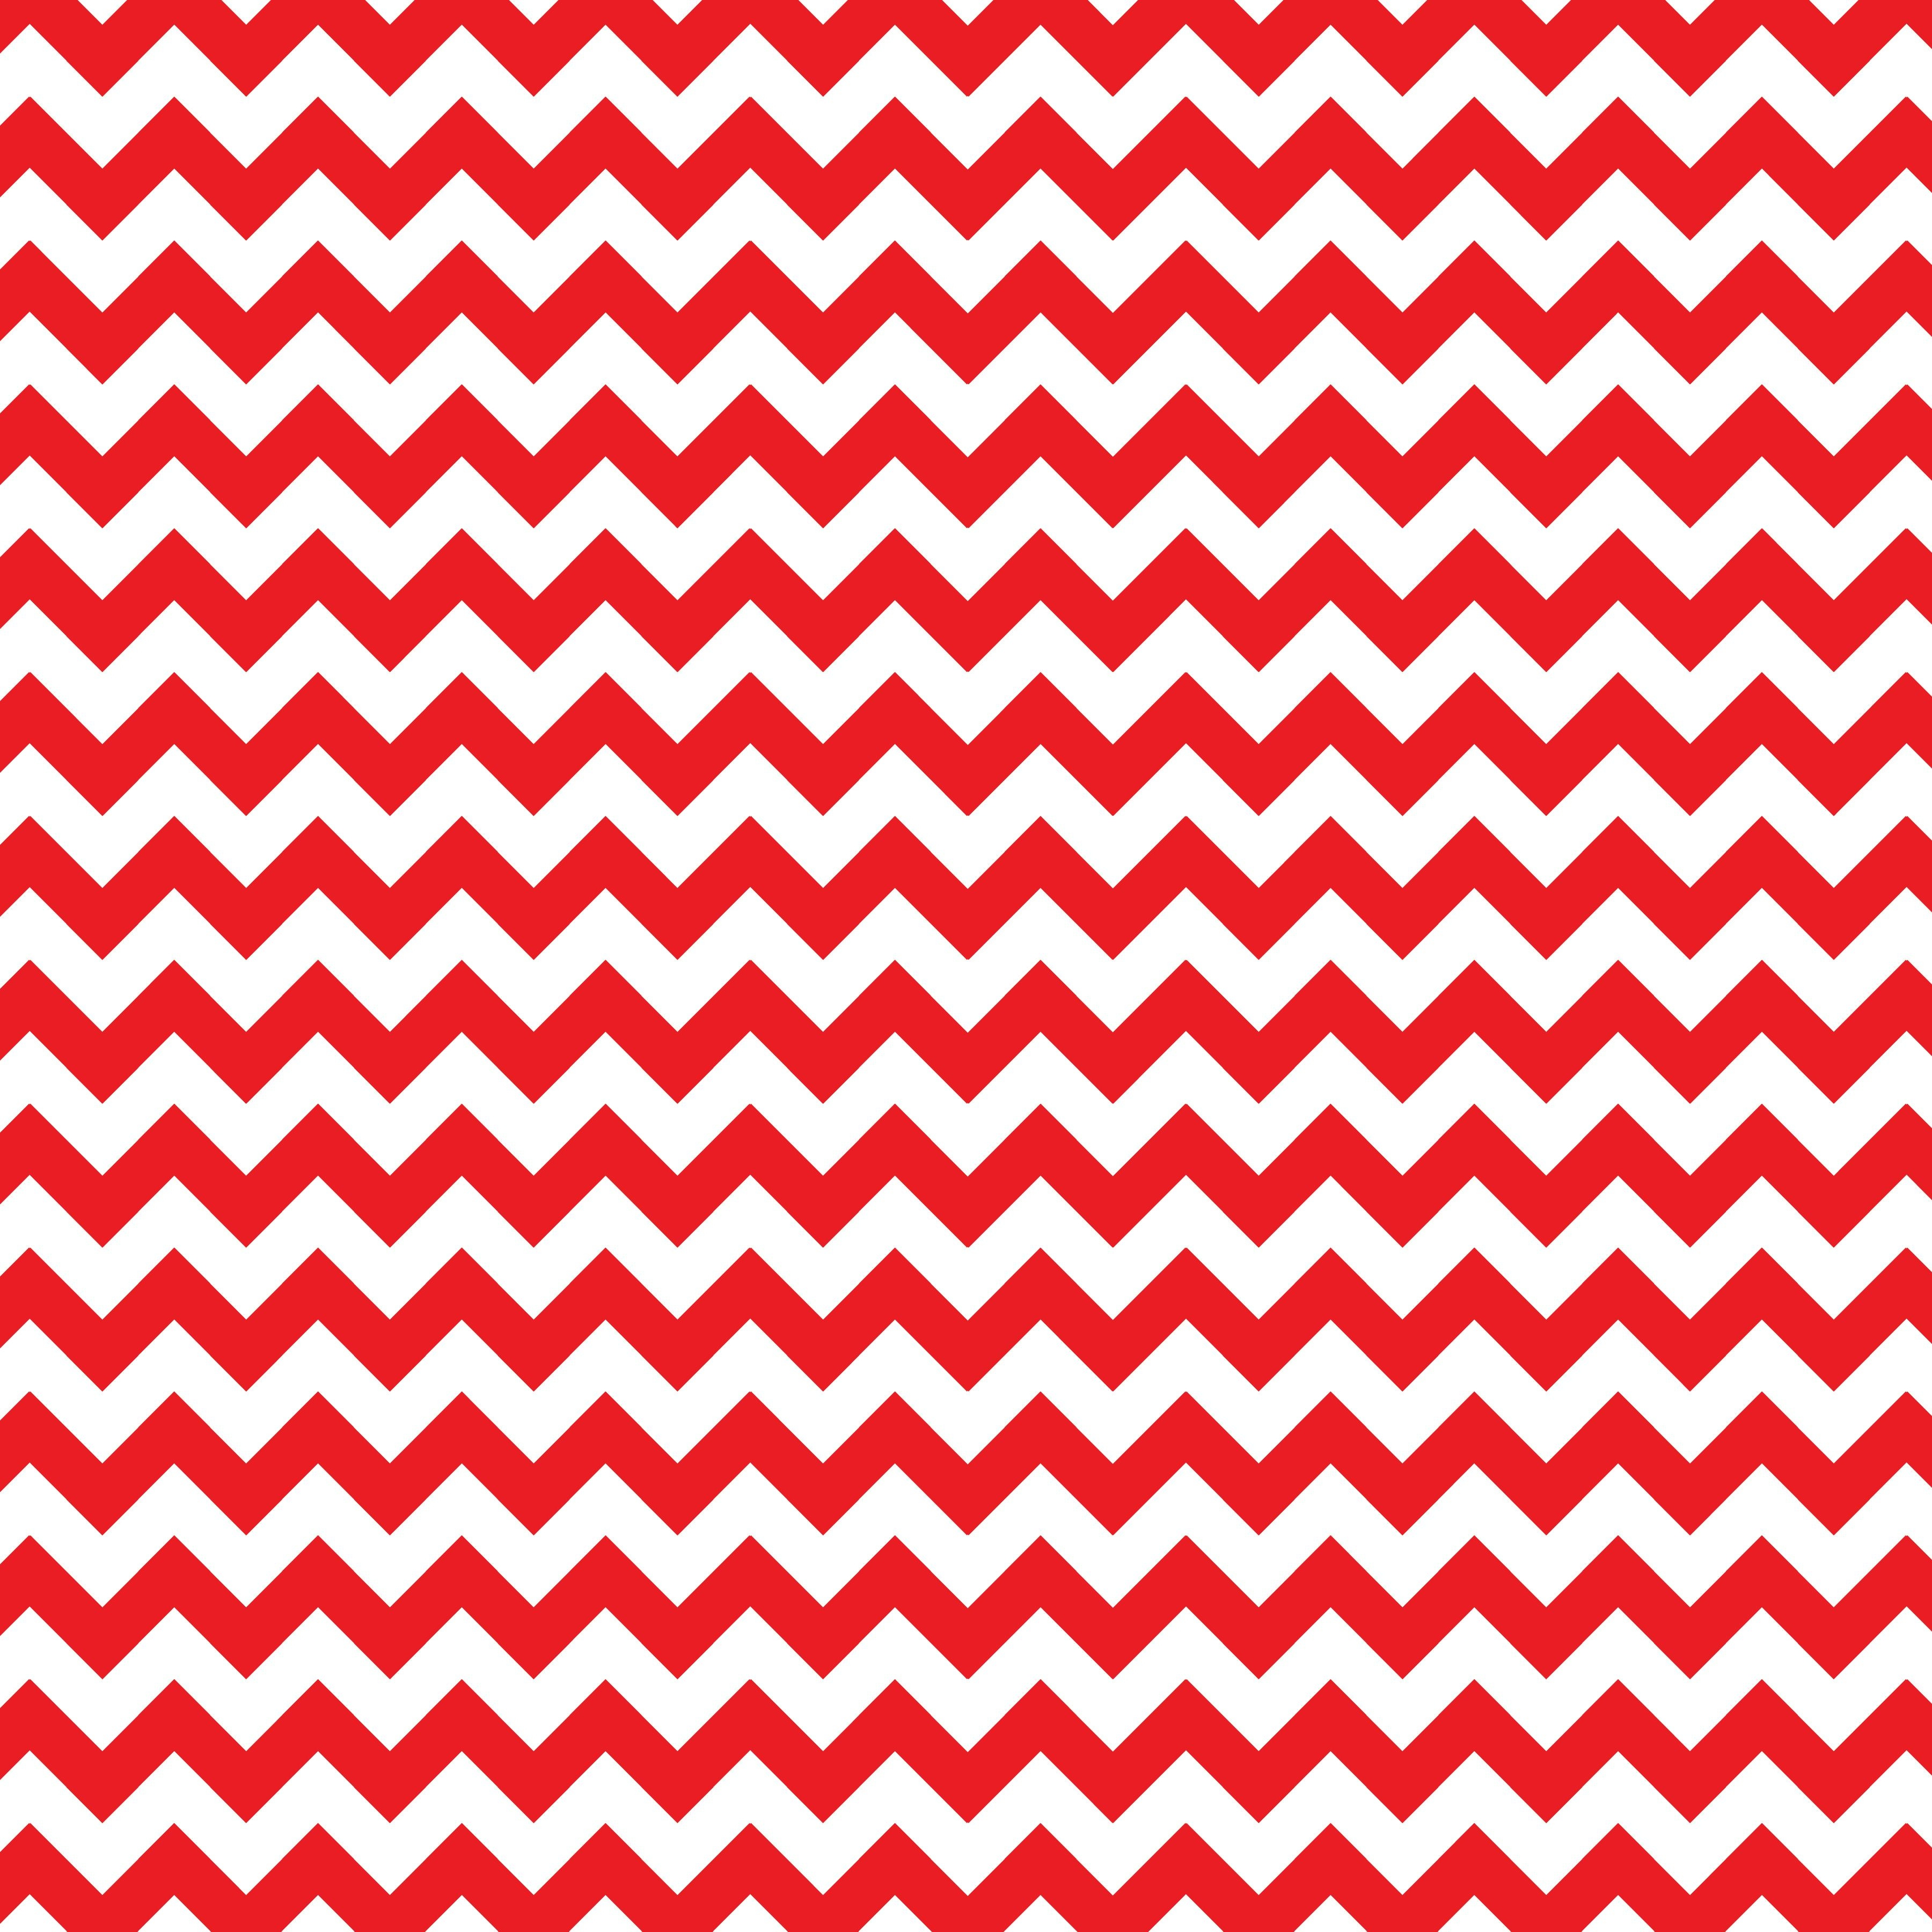 Chevron Digital Paper – Free Download | Pattern, Color & Design - Chevron Pattern Printable Free